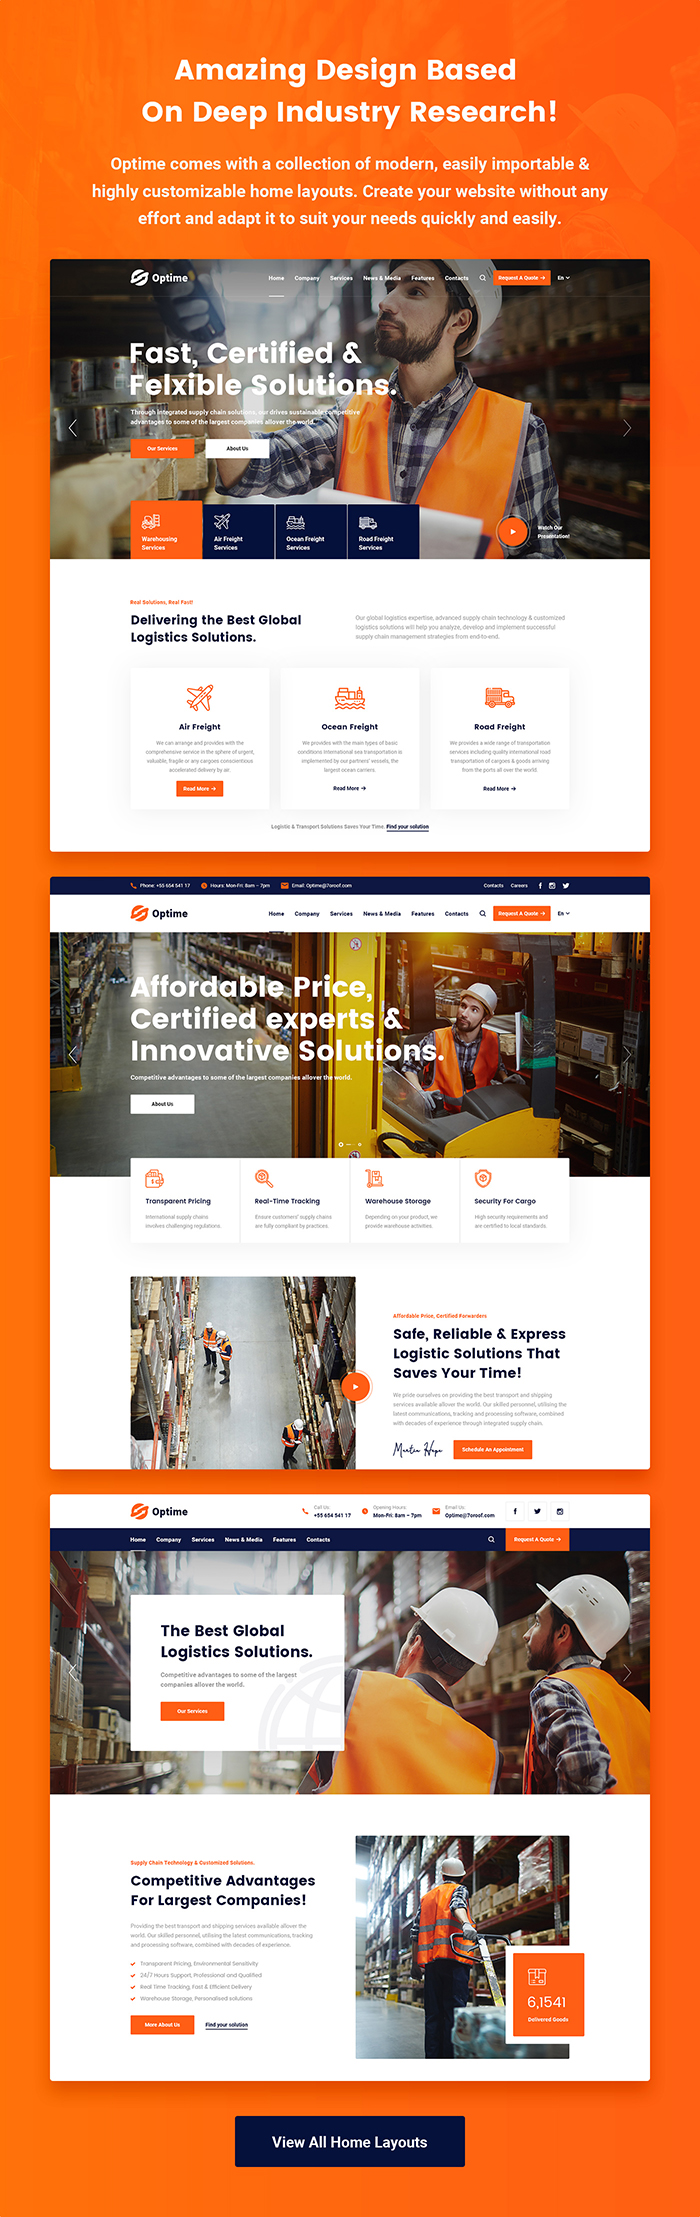 Optime - Logistics & Transportation HTML5 Template - 6